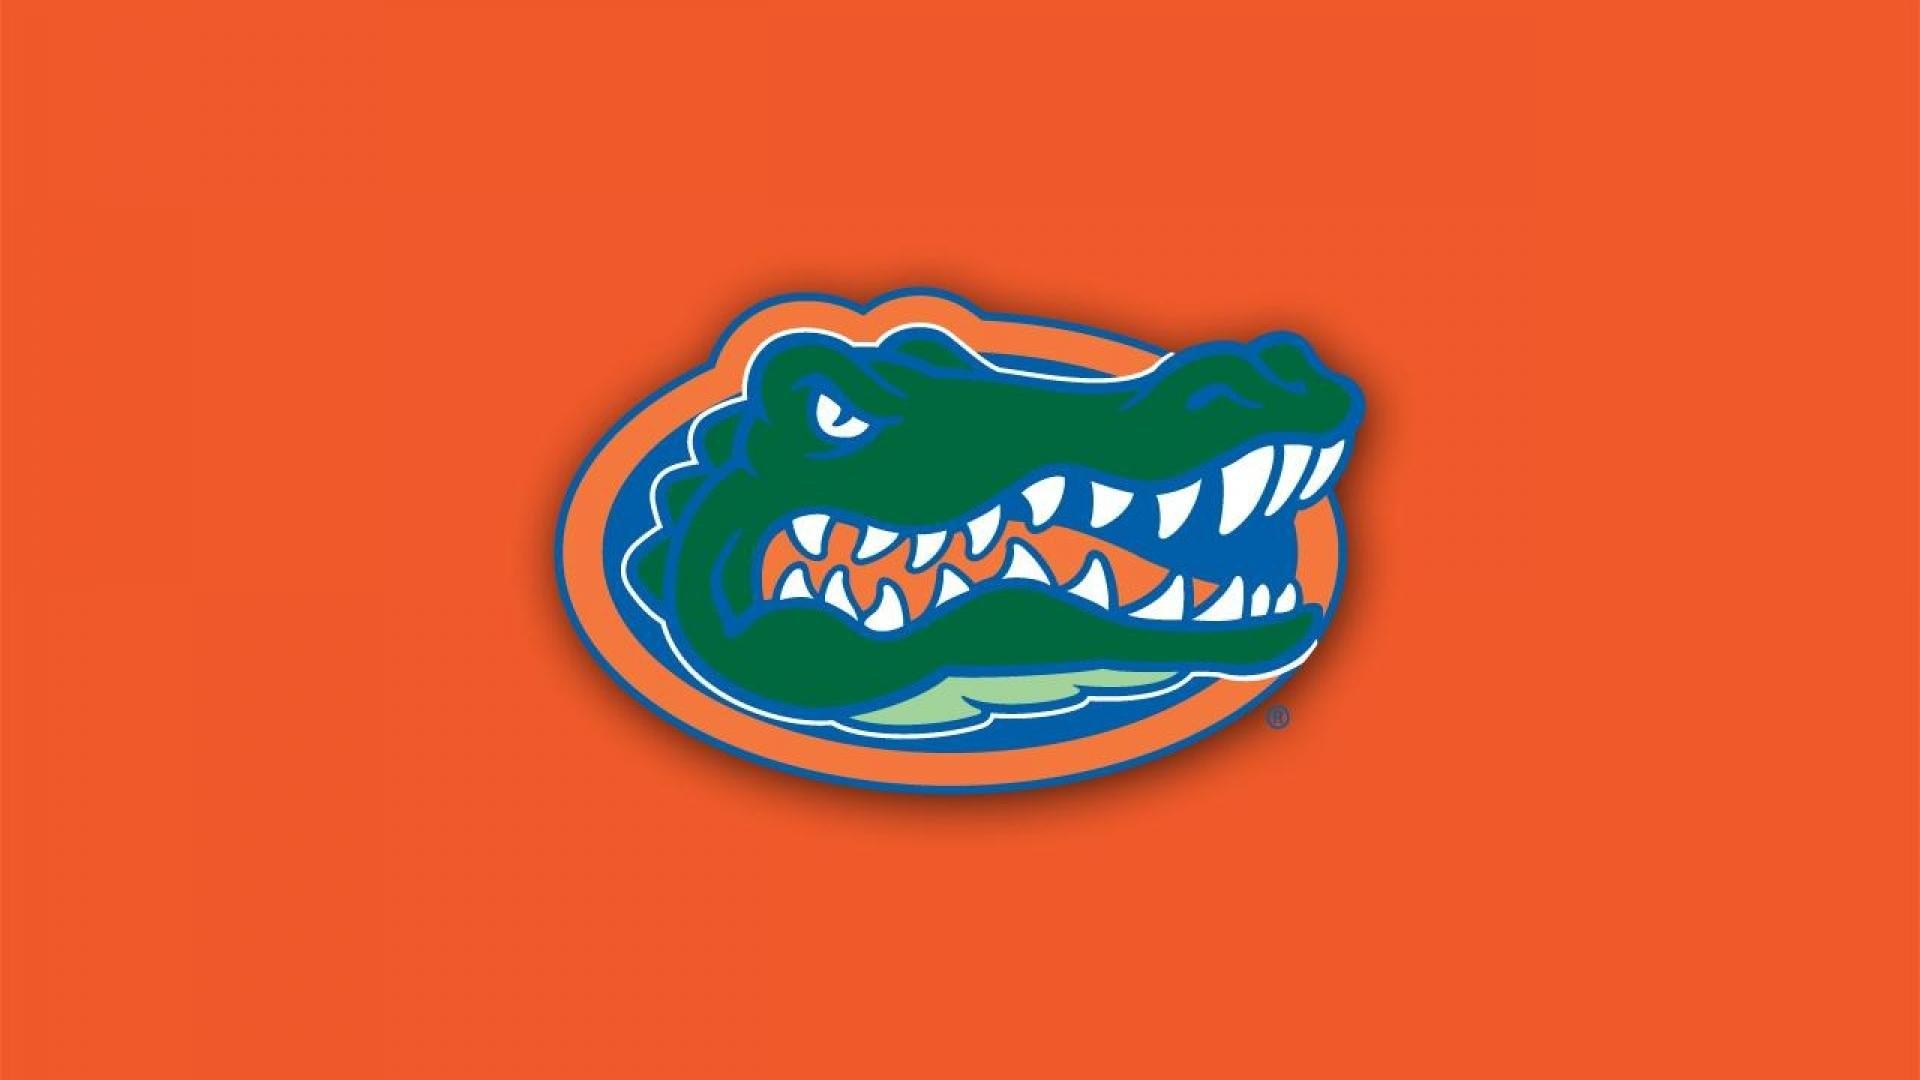 11 HD Florida Gators Desktop Wallpapers For Free Download